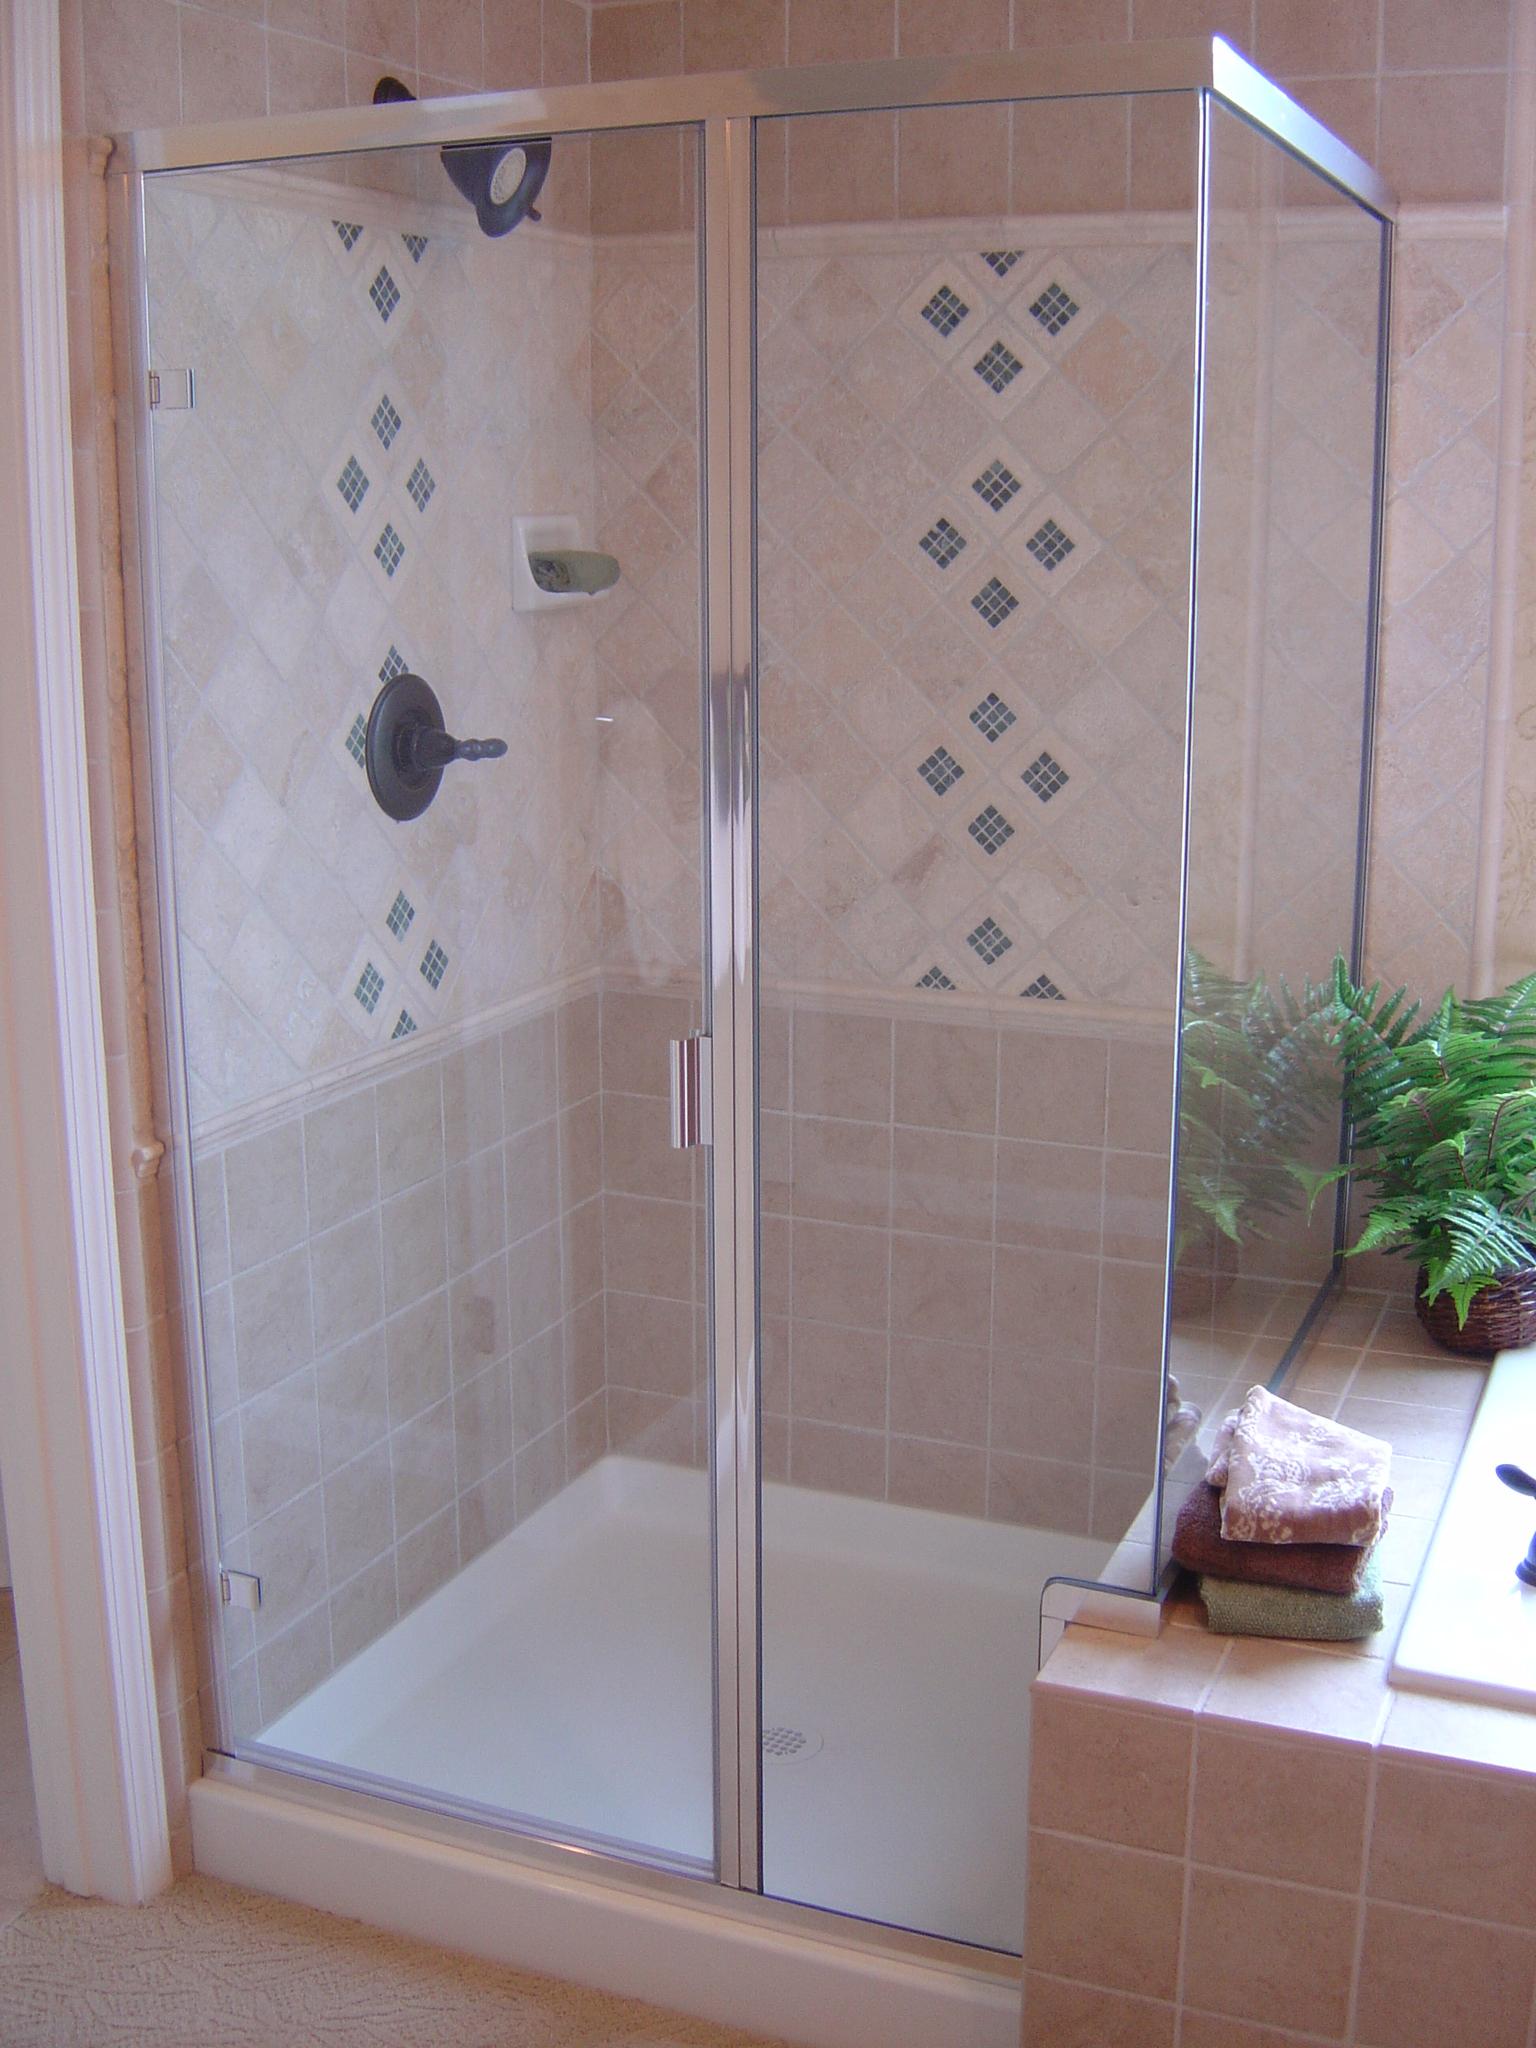 Plan 2 mb shower.JPG